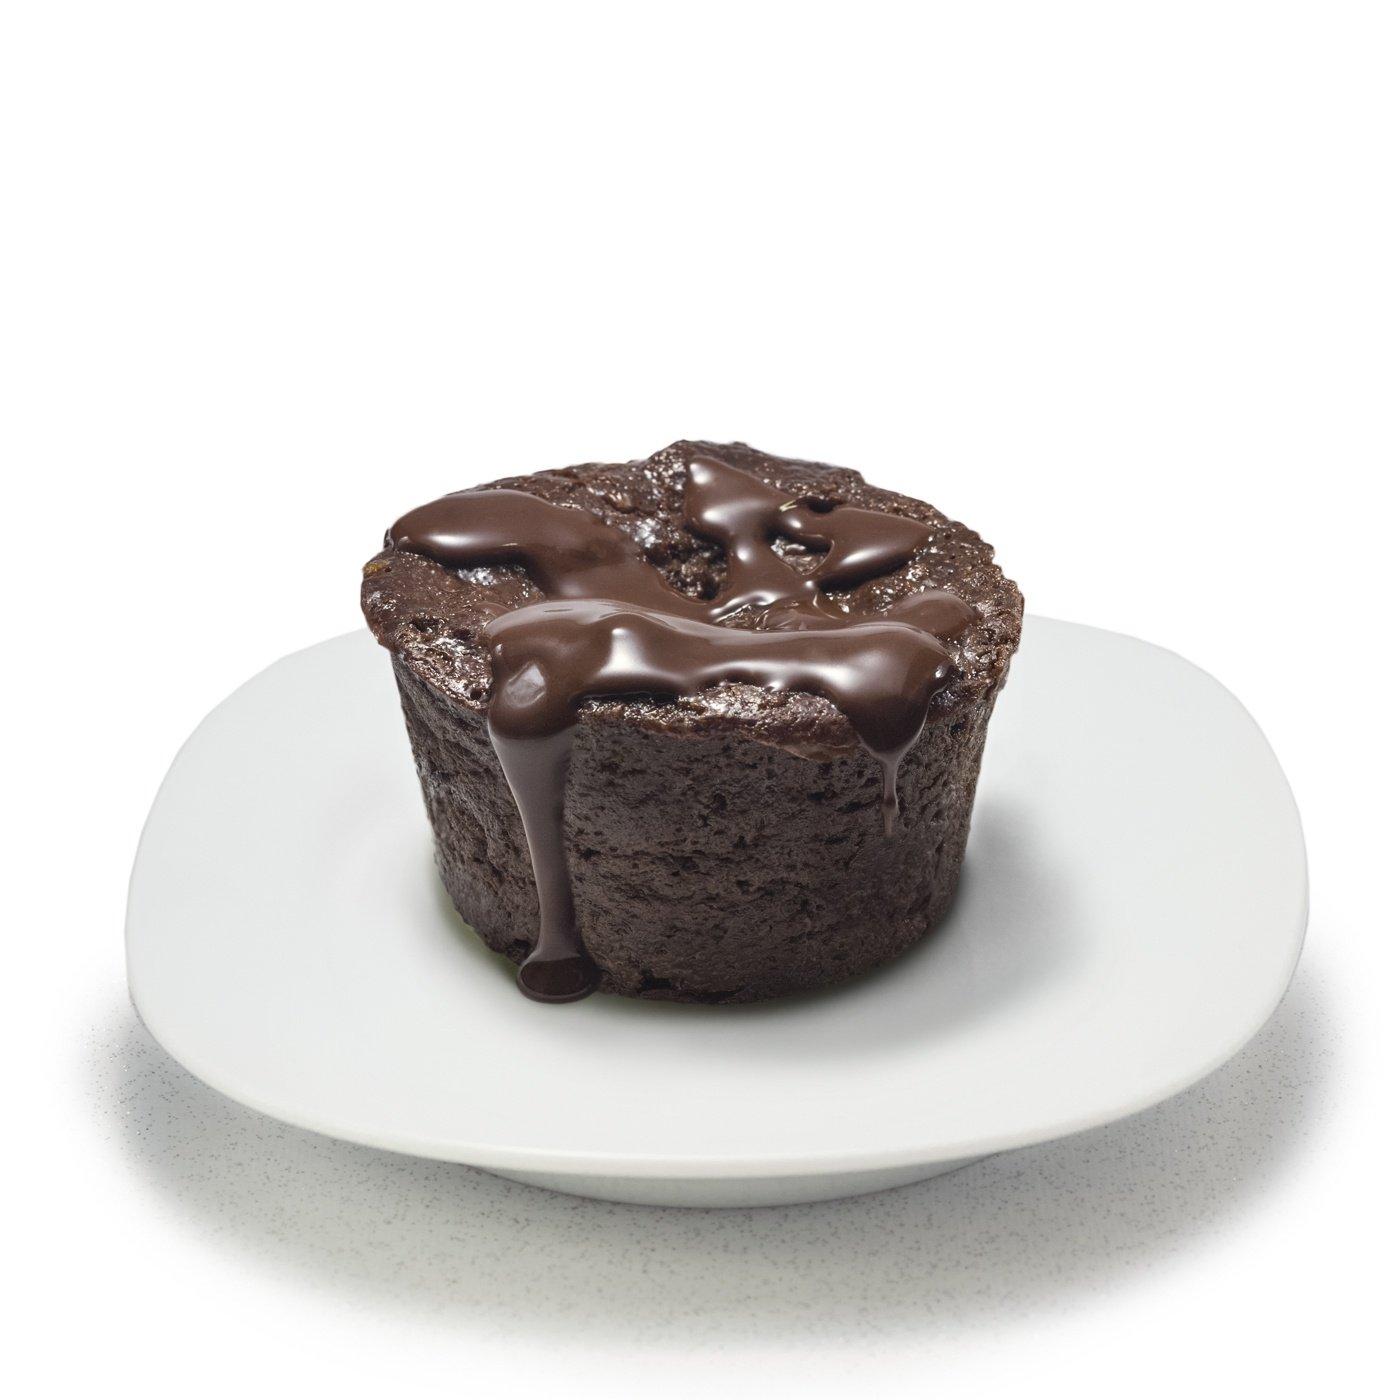 Bread Pudding - Chocolate